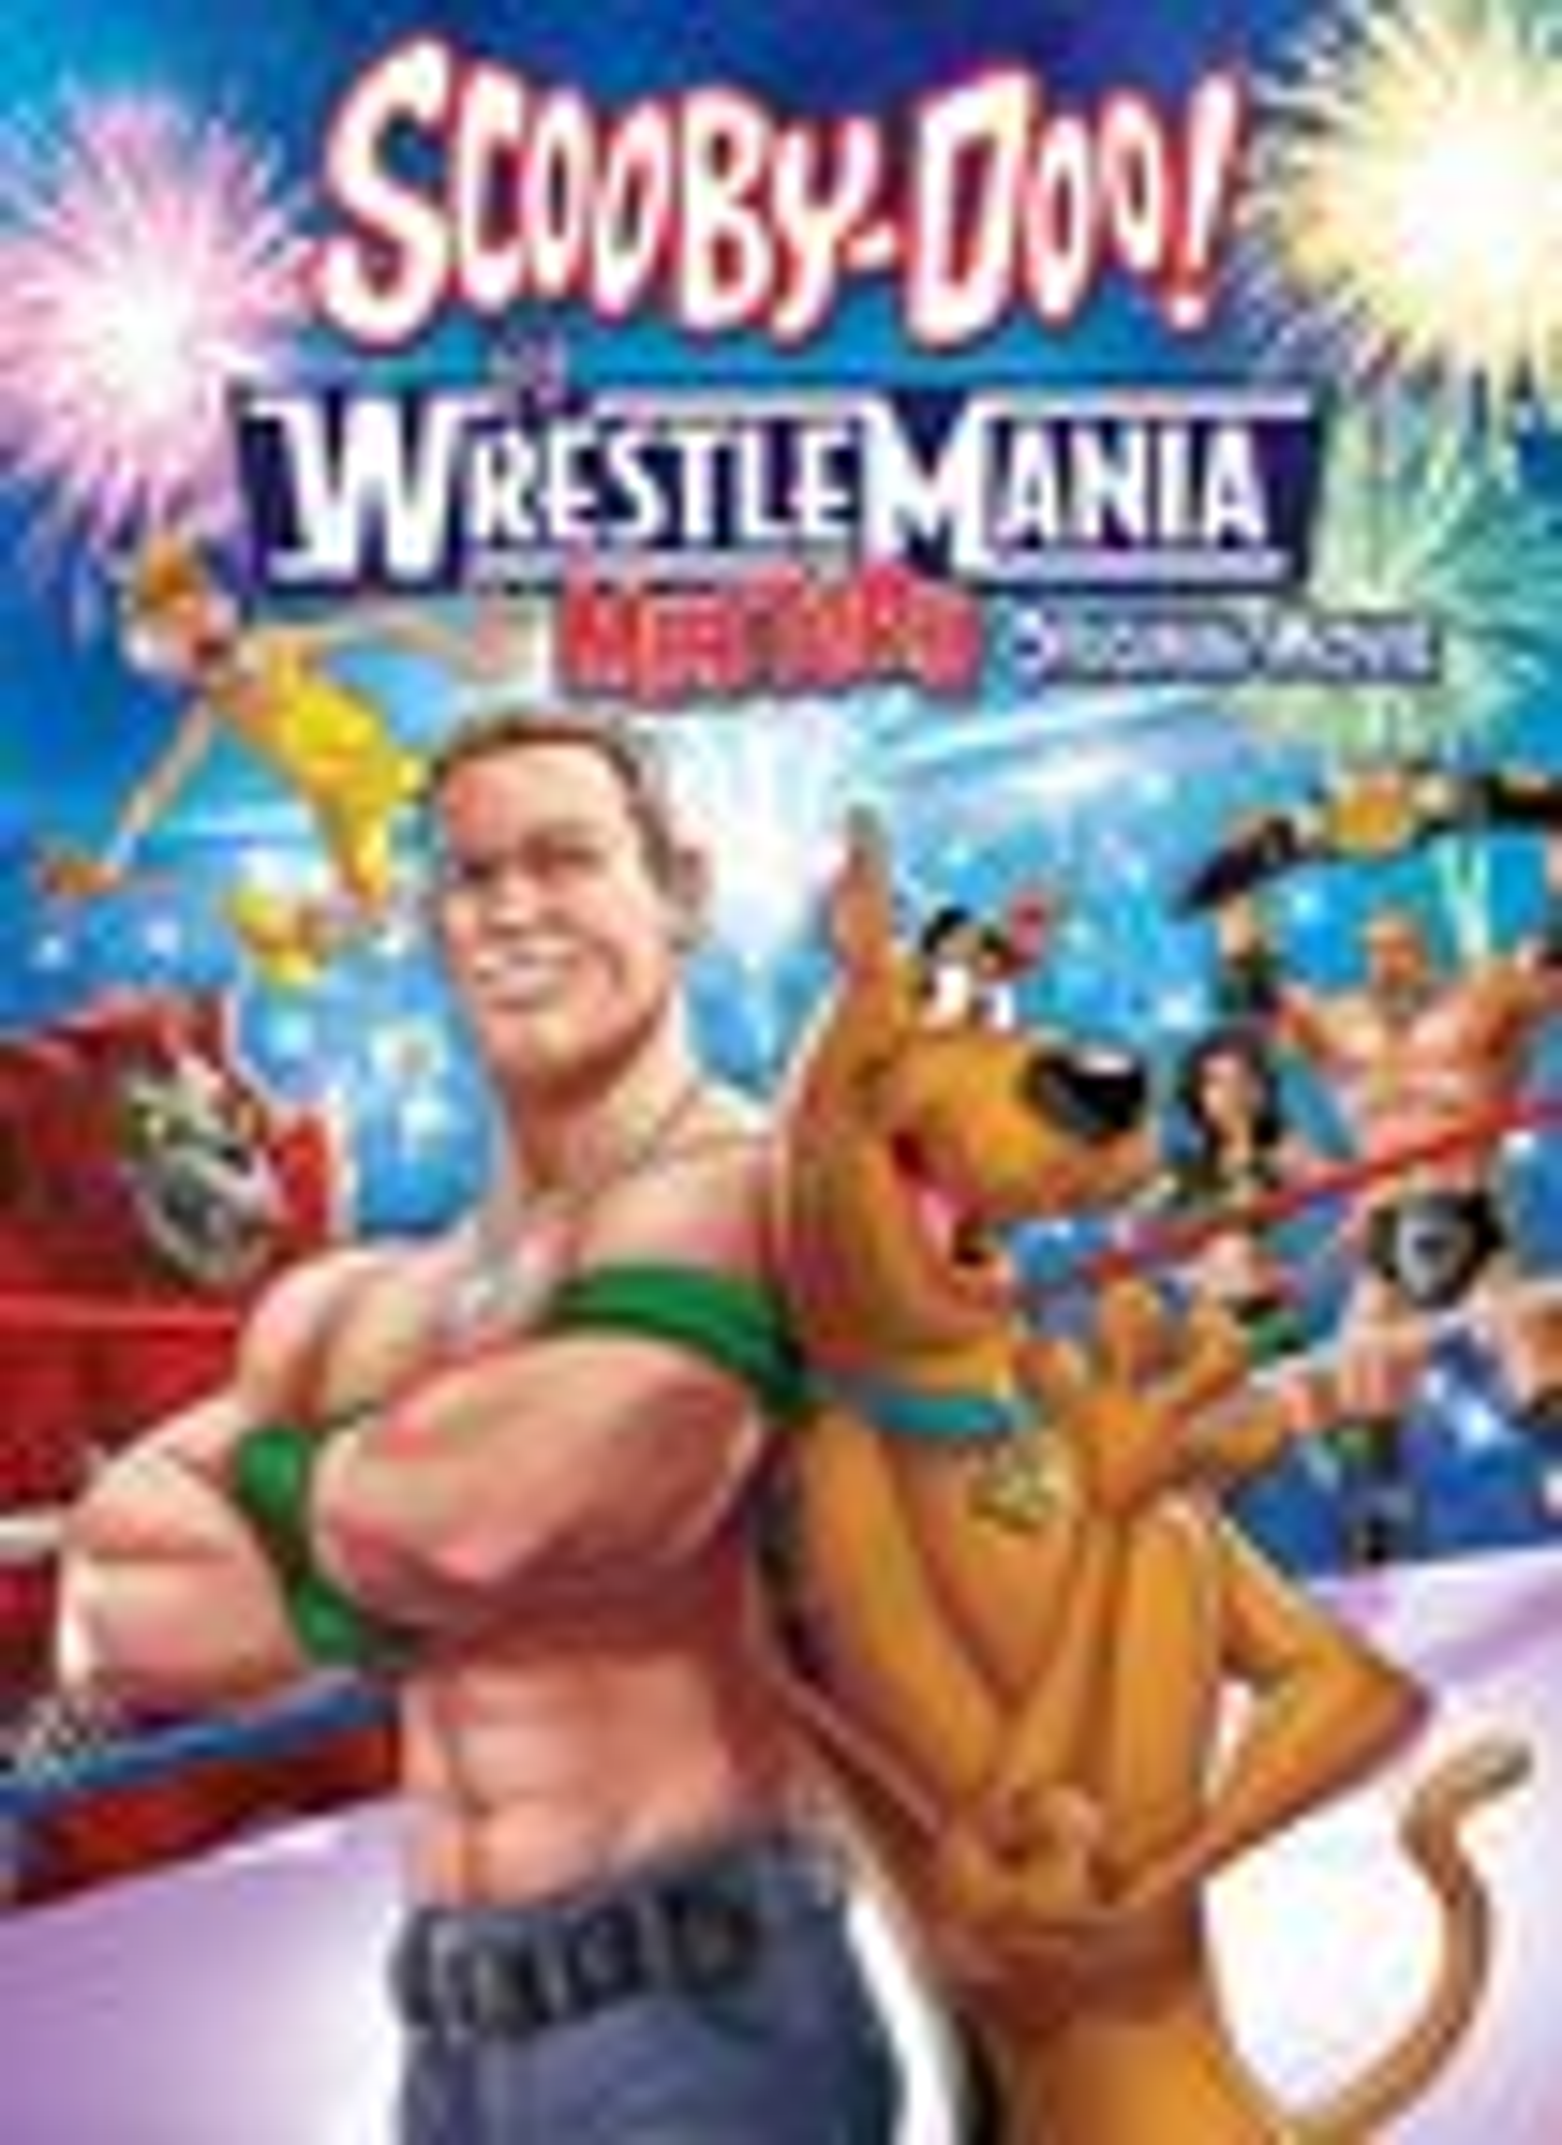 Scooby-doo!: Wrestlemania Mystery (dvd) 3286106